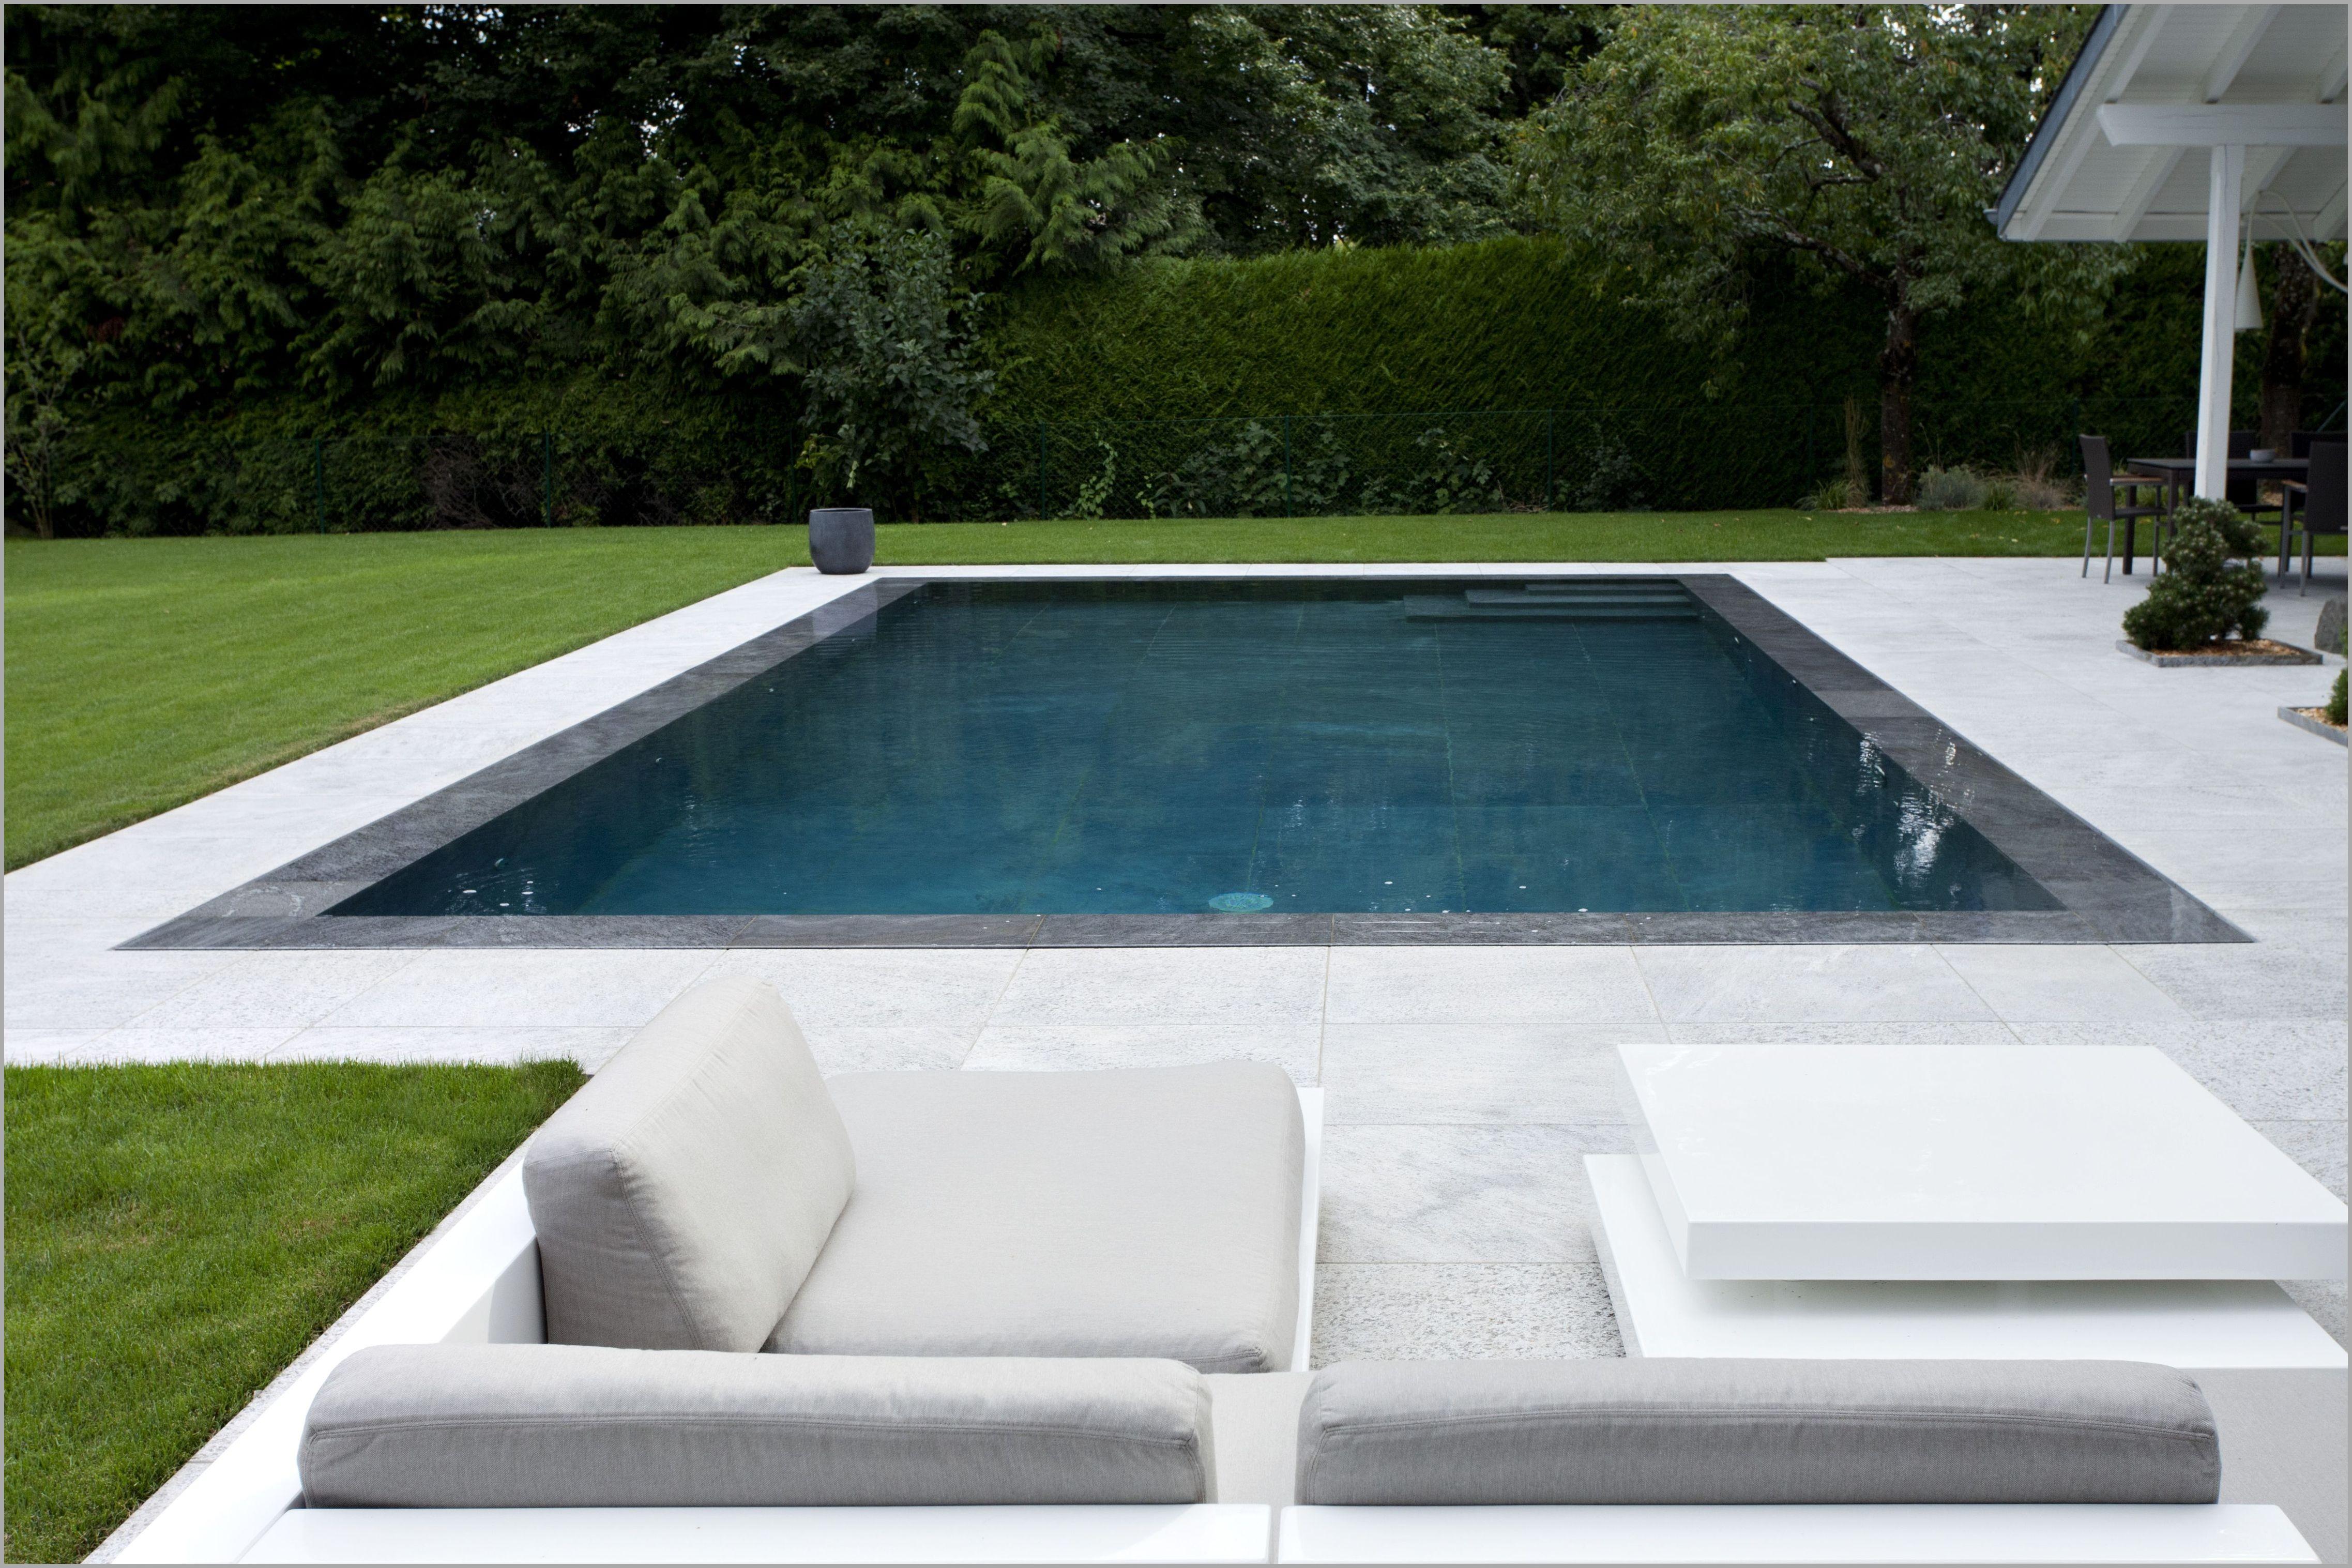 accessoire piscine suisse. Black Bedroom Furniture Sets. Home Design Ideas